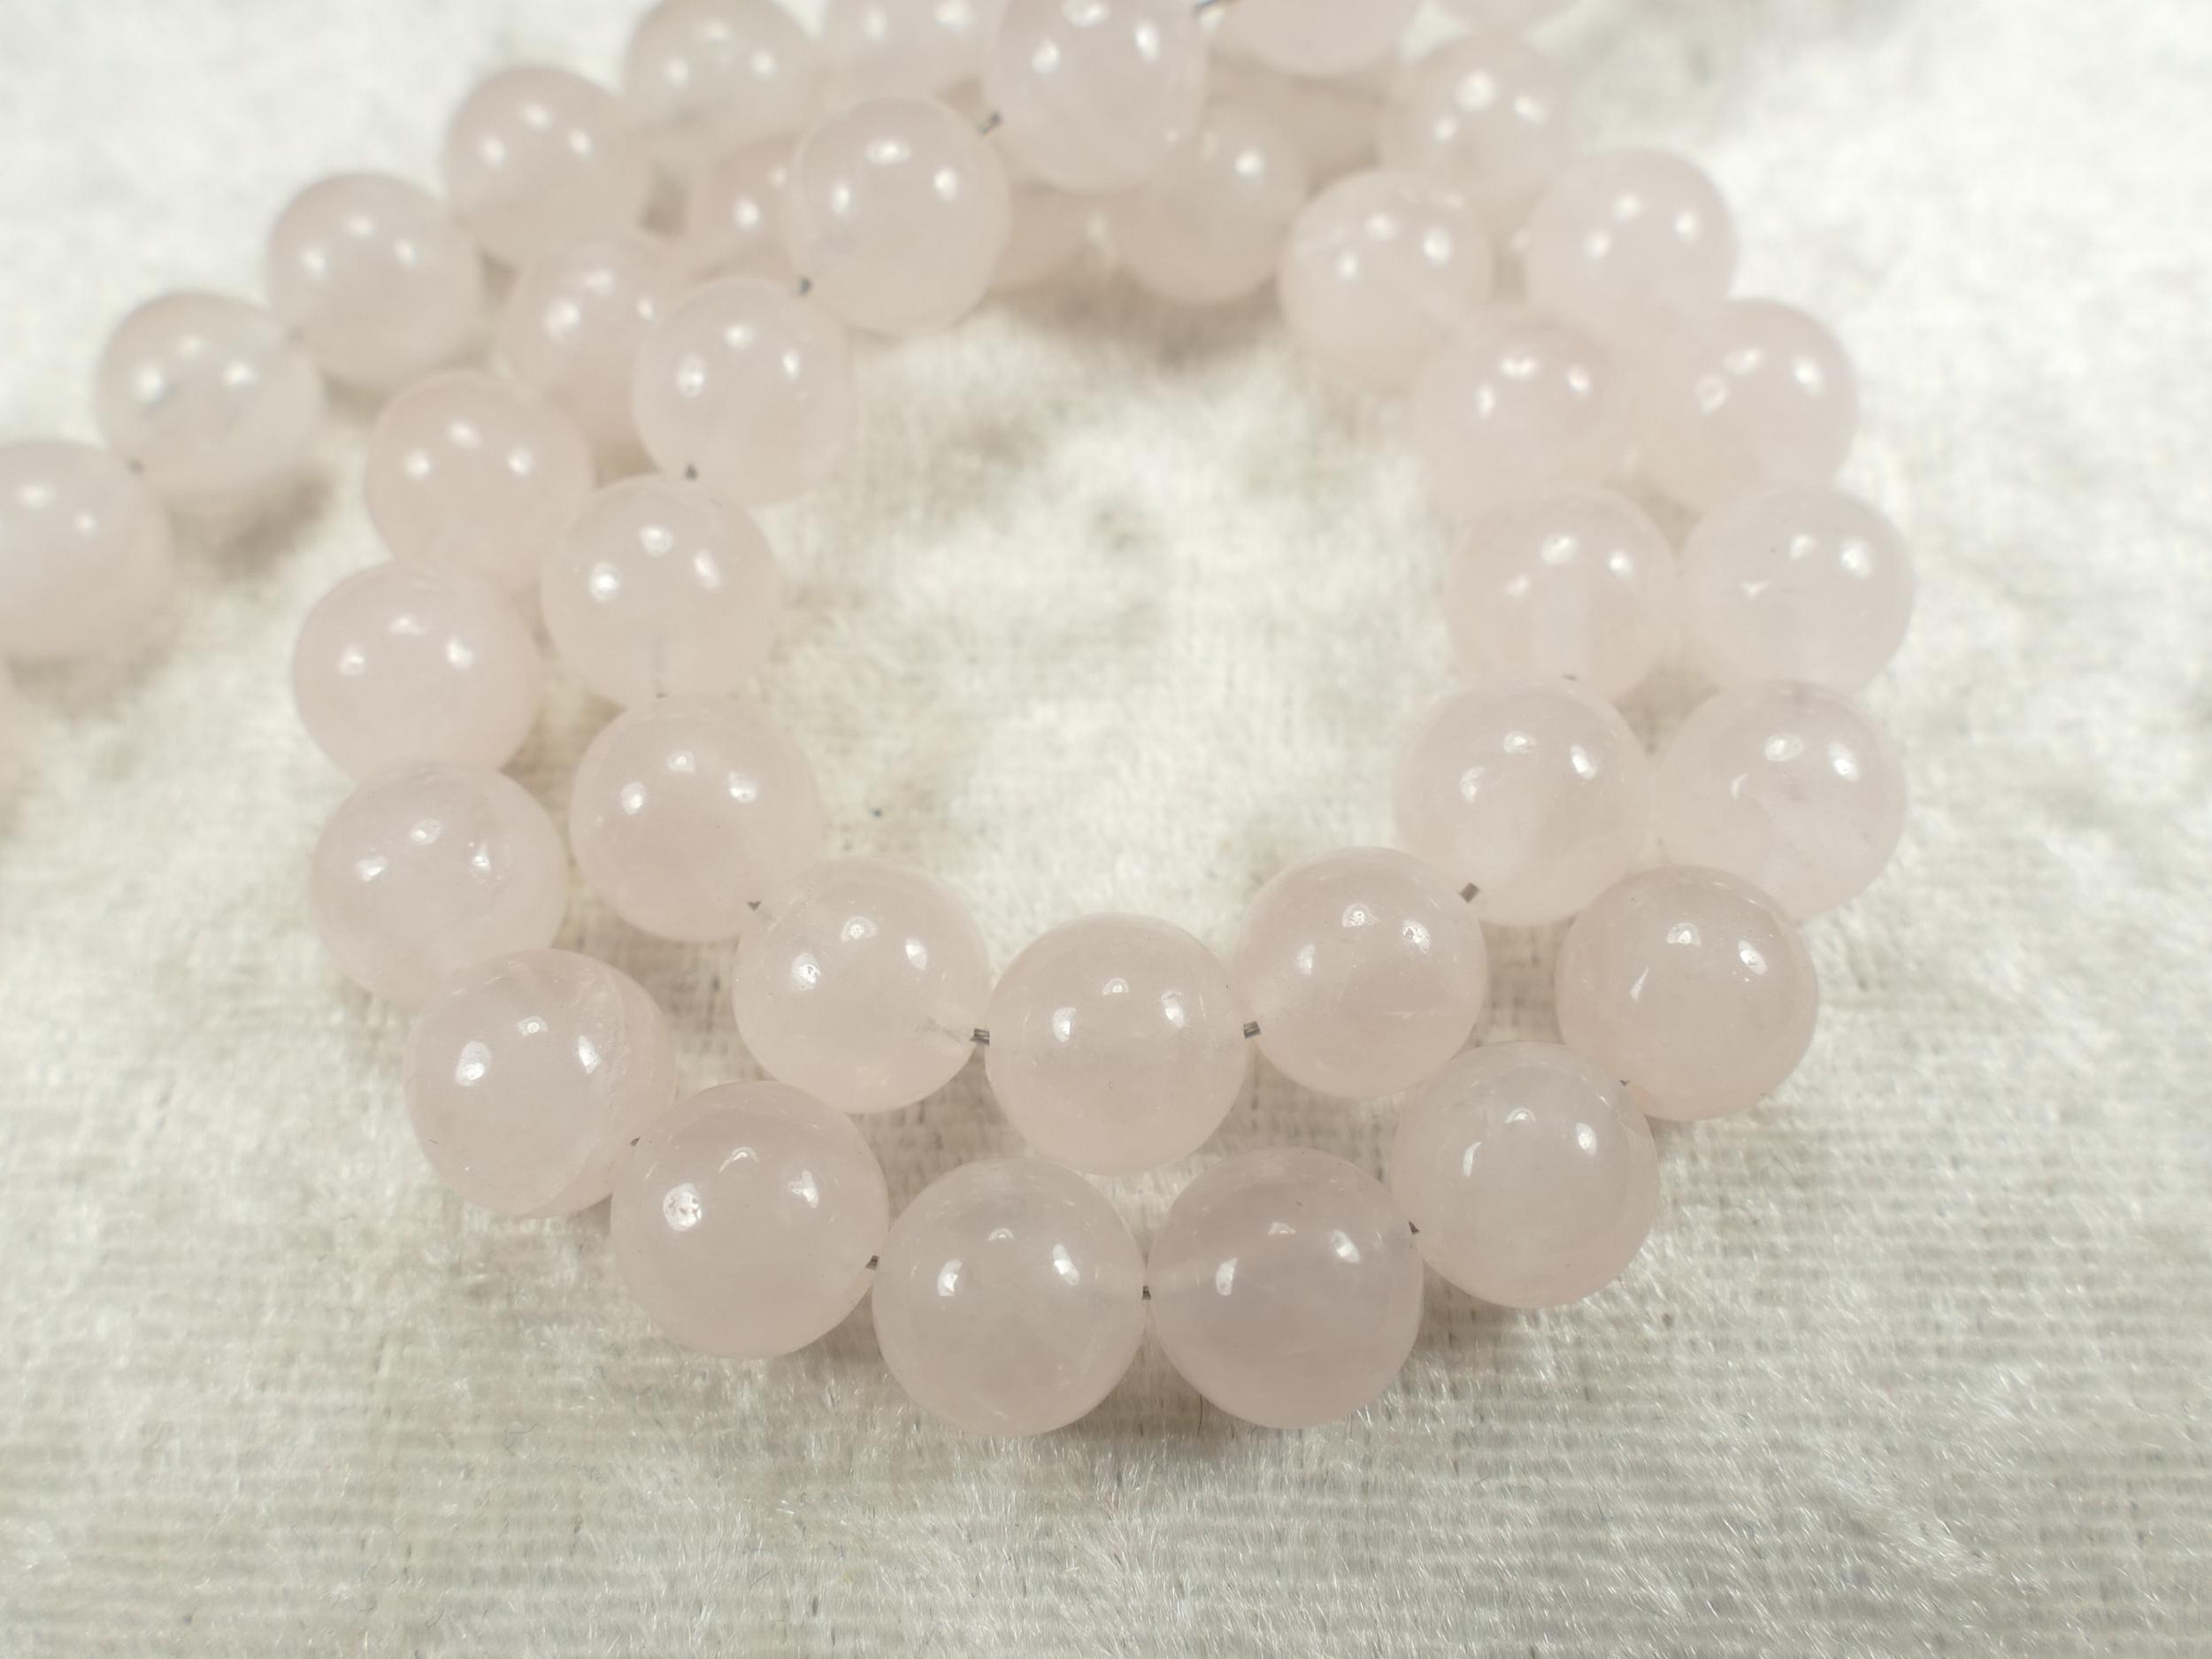 8.4mm x16 Perles de Quartz rose naturelle boule / ronde lisse (#AC657)